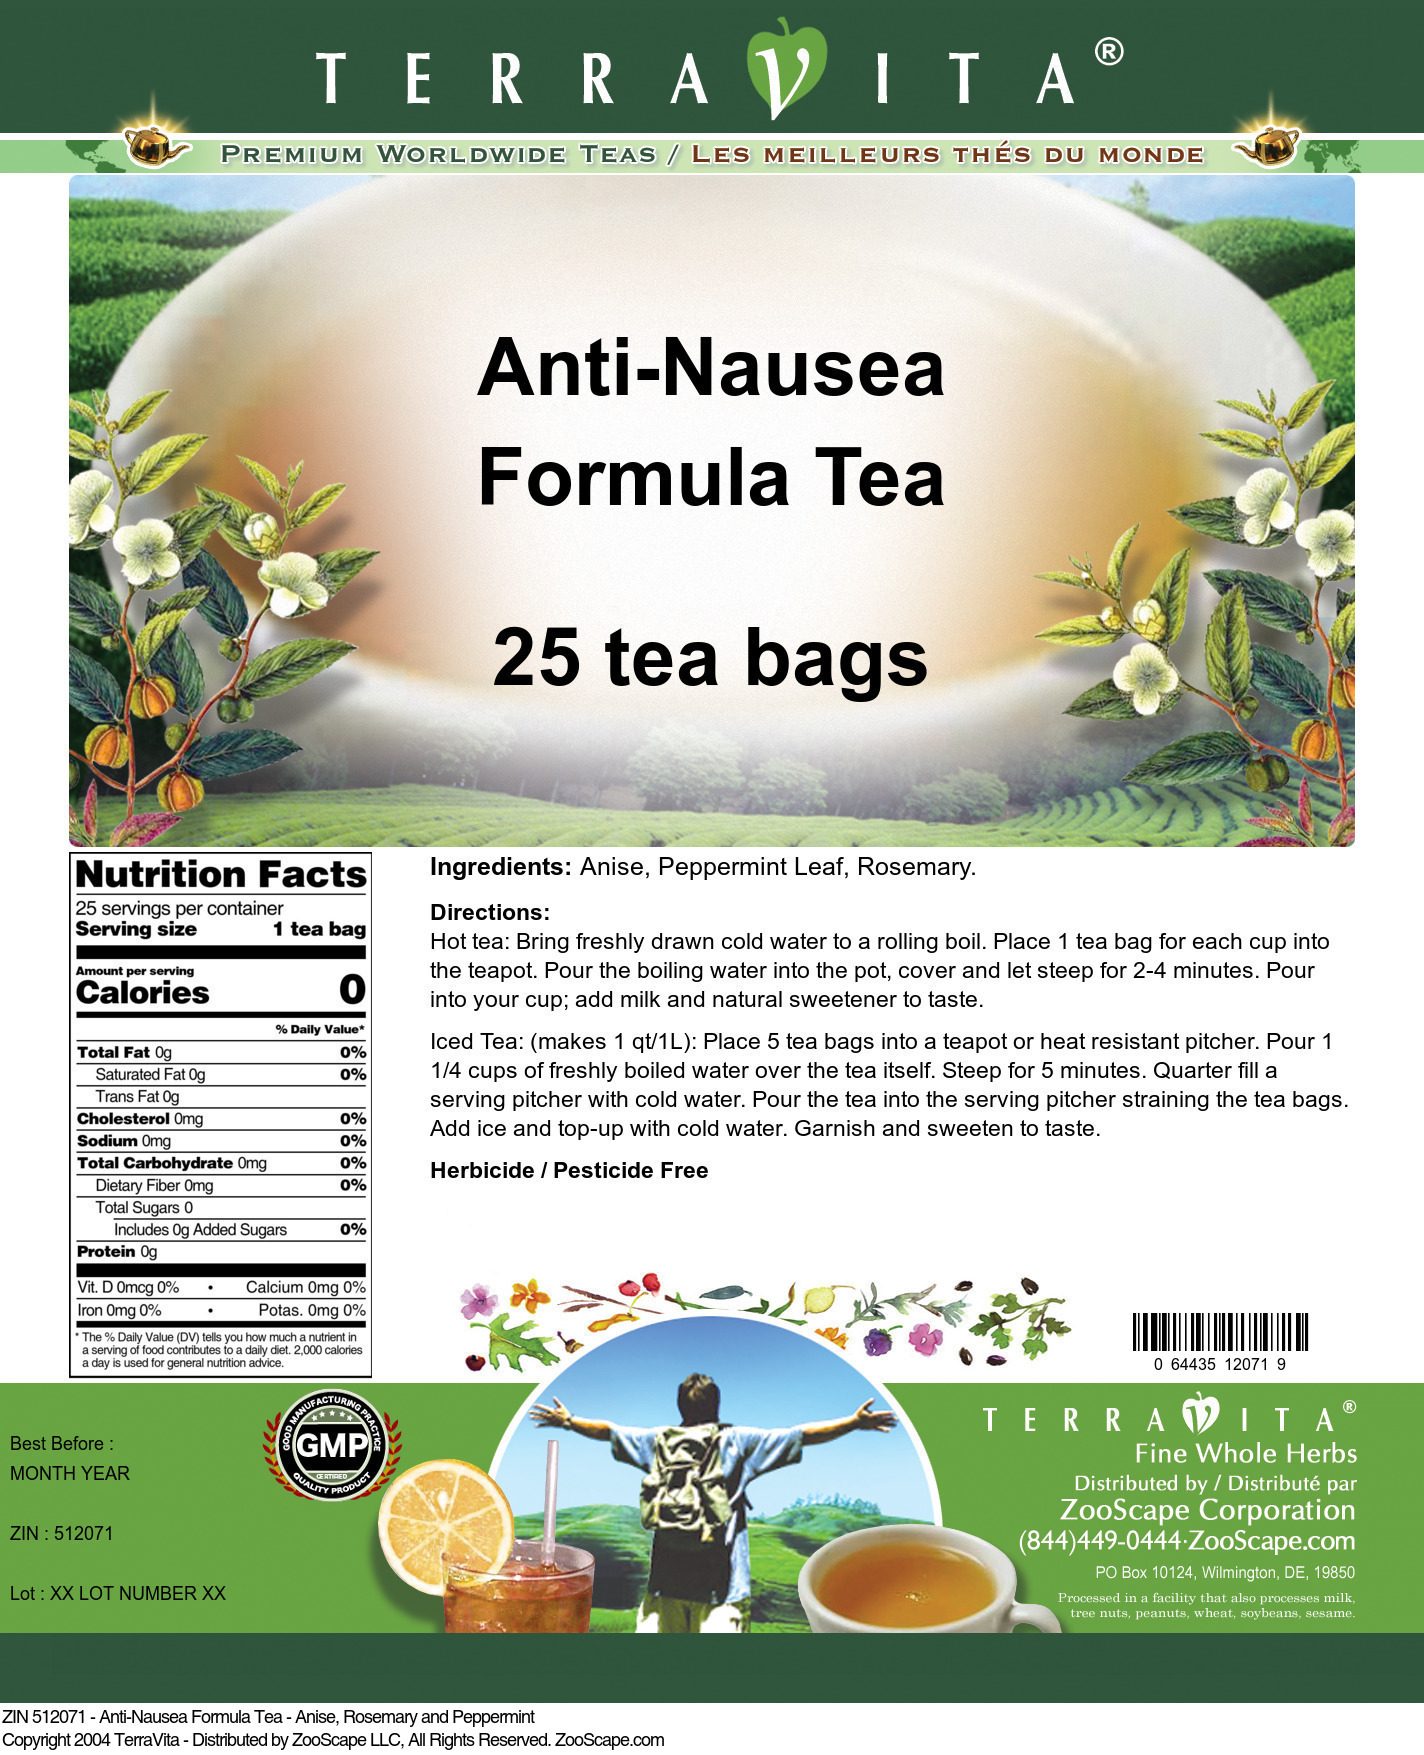 Anti-Nausea Formula Tea - Anise, Rosemary and Peppermint